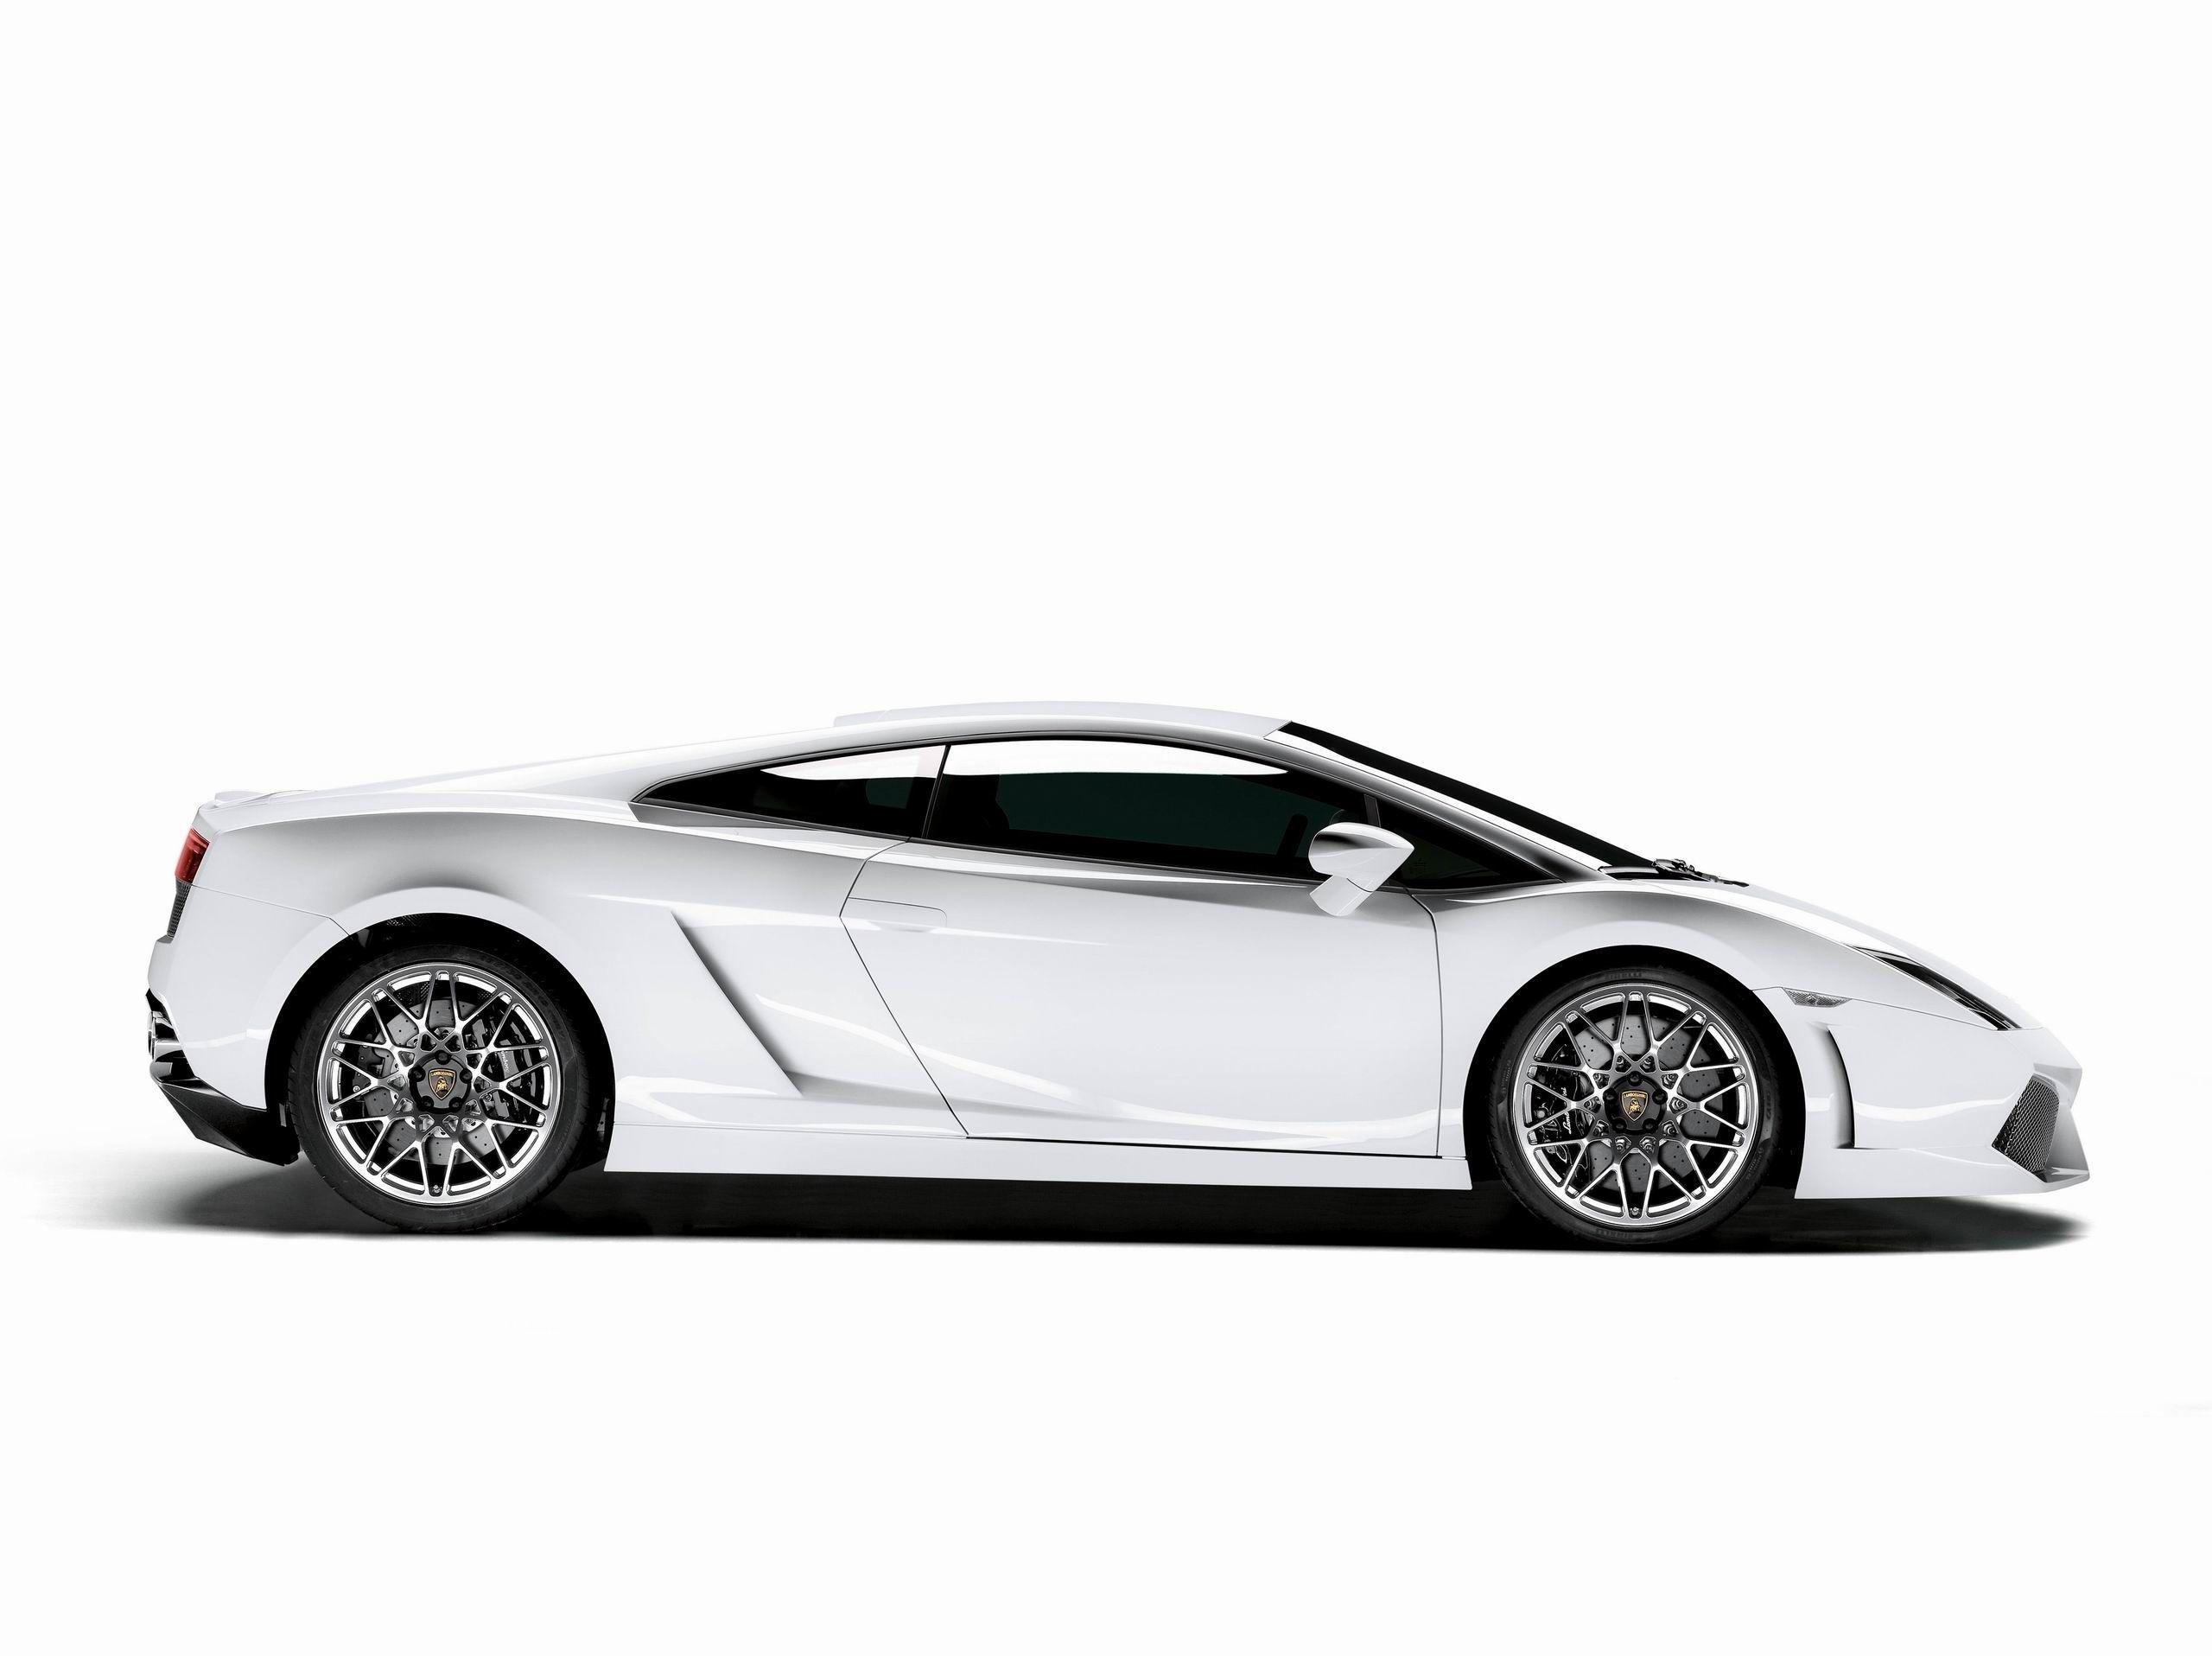 Lamborghini Gallardo Lp560 4 Side View Detail Lamborghini Gallardo Lamborghini Buy Tires